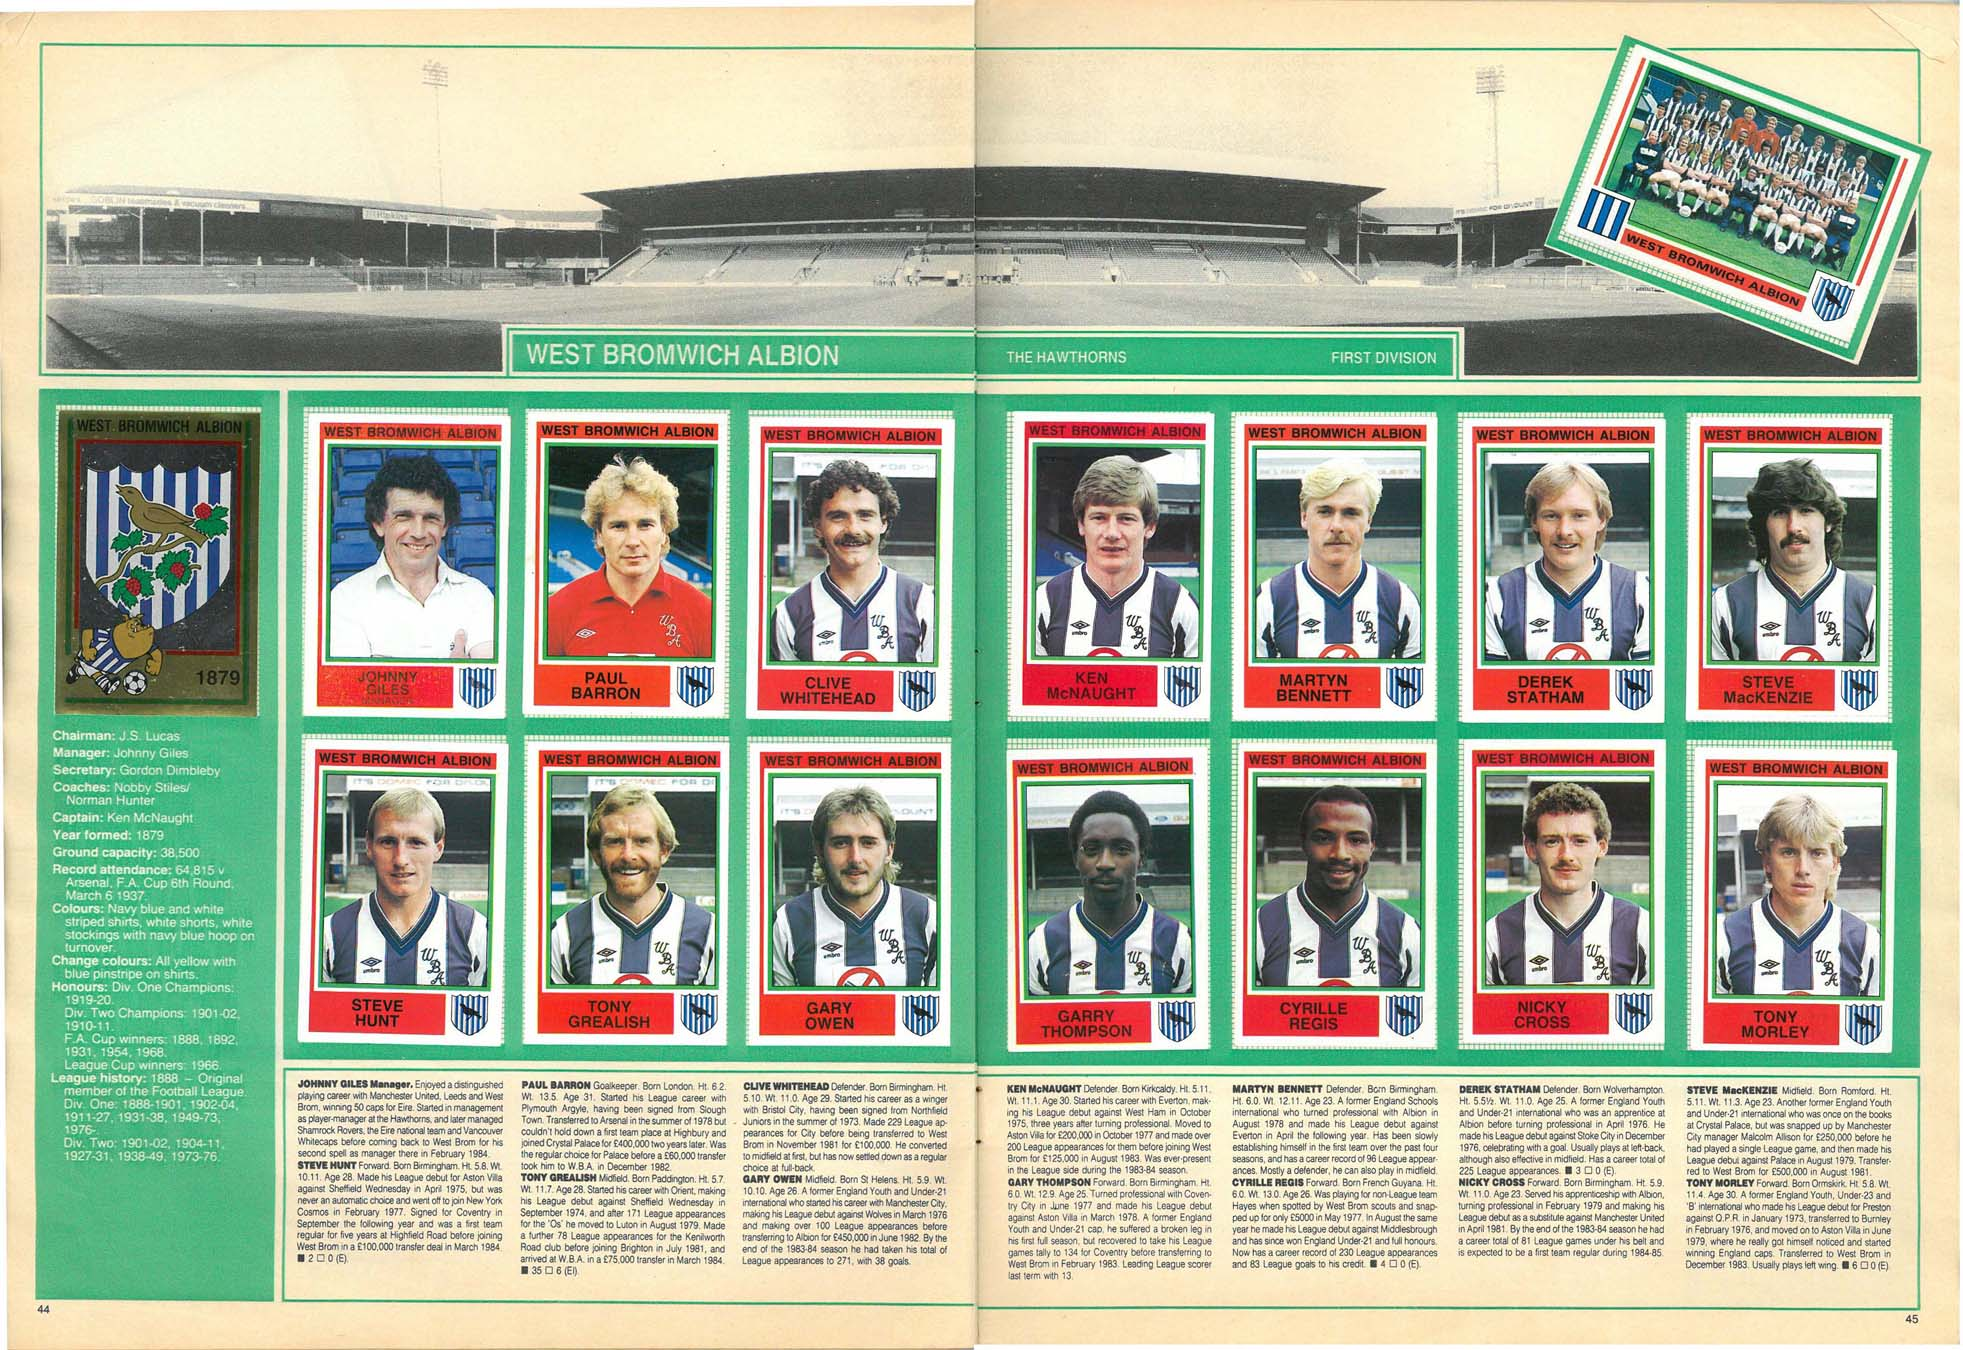 West Bromwich Albion 1985